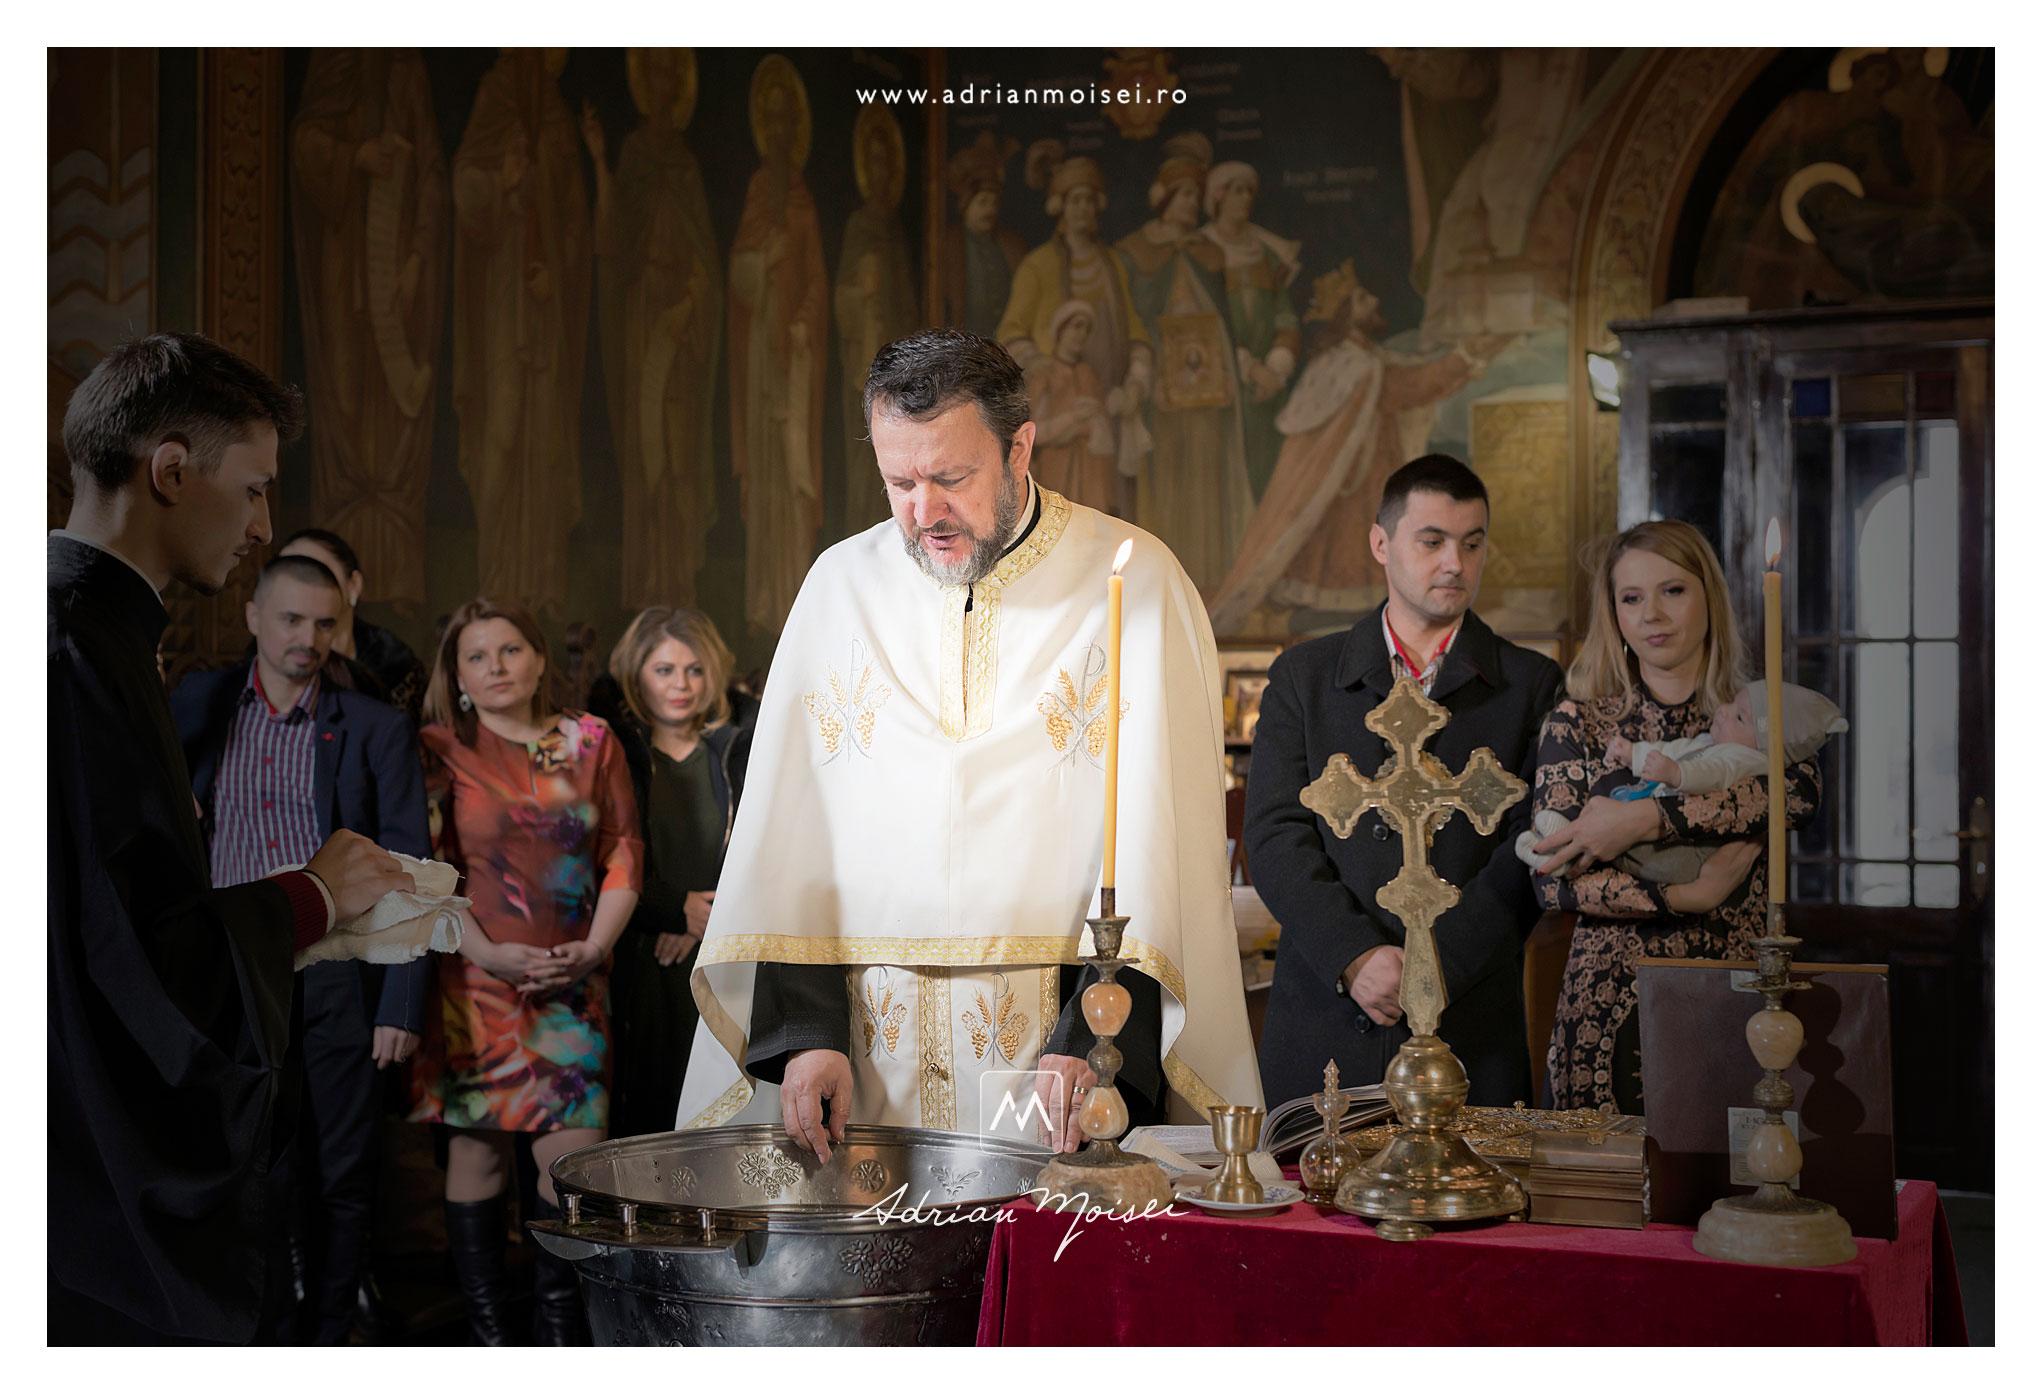 Preot in timpul slujbei de botez